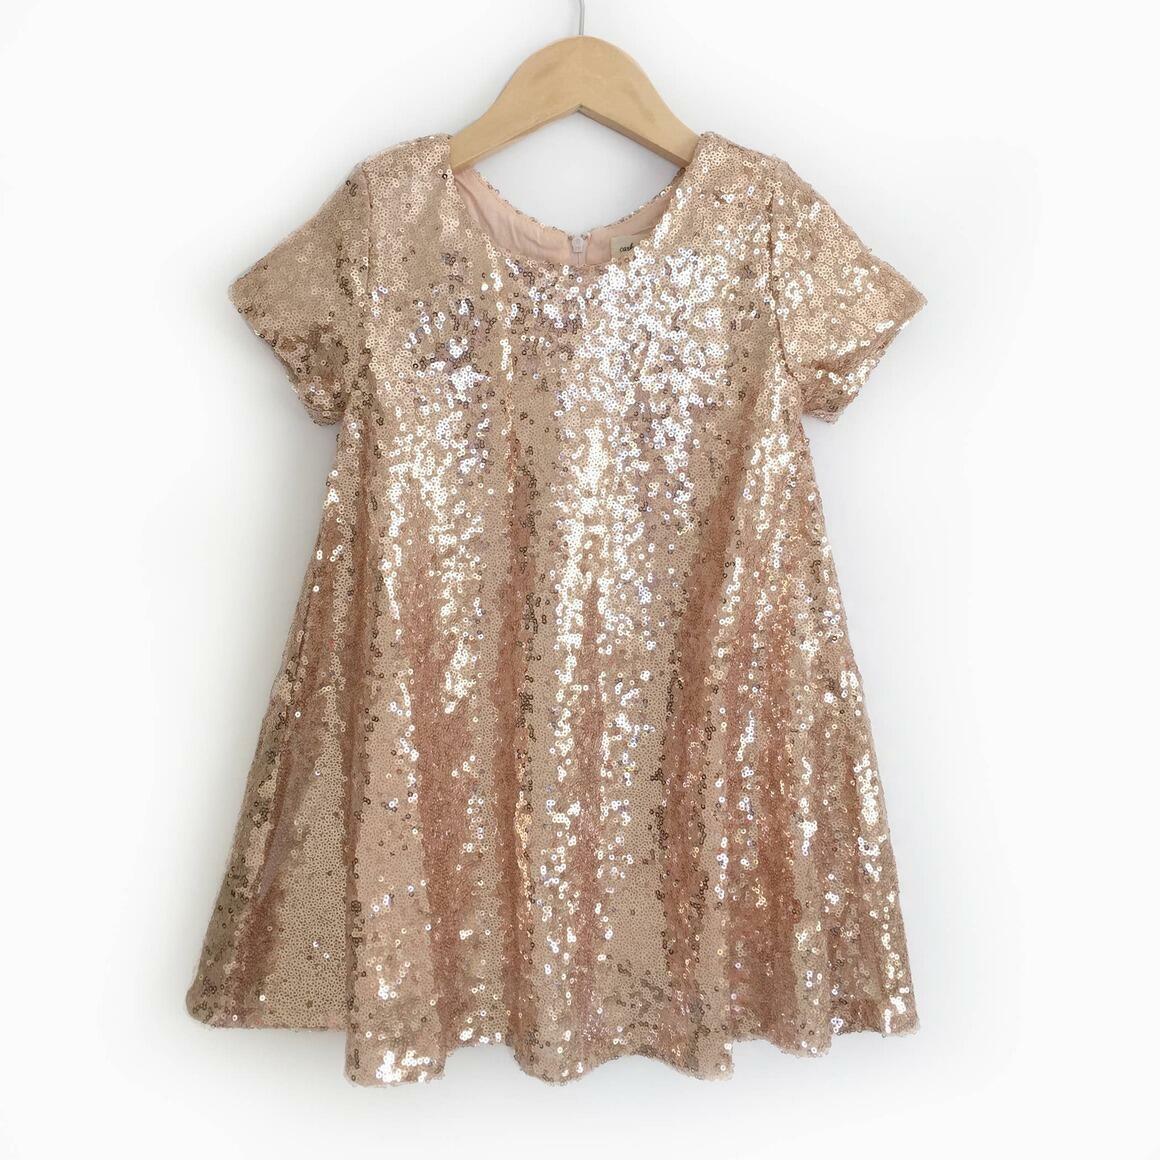 Rose Gold Sequin Dress - Short Sleeves | Trada Marketplace